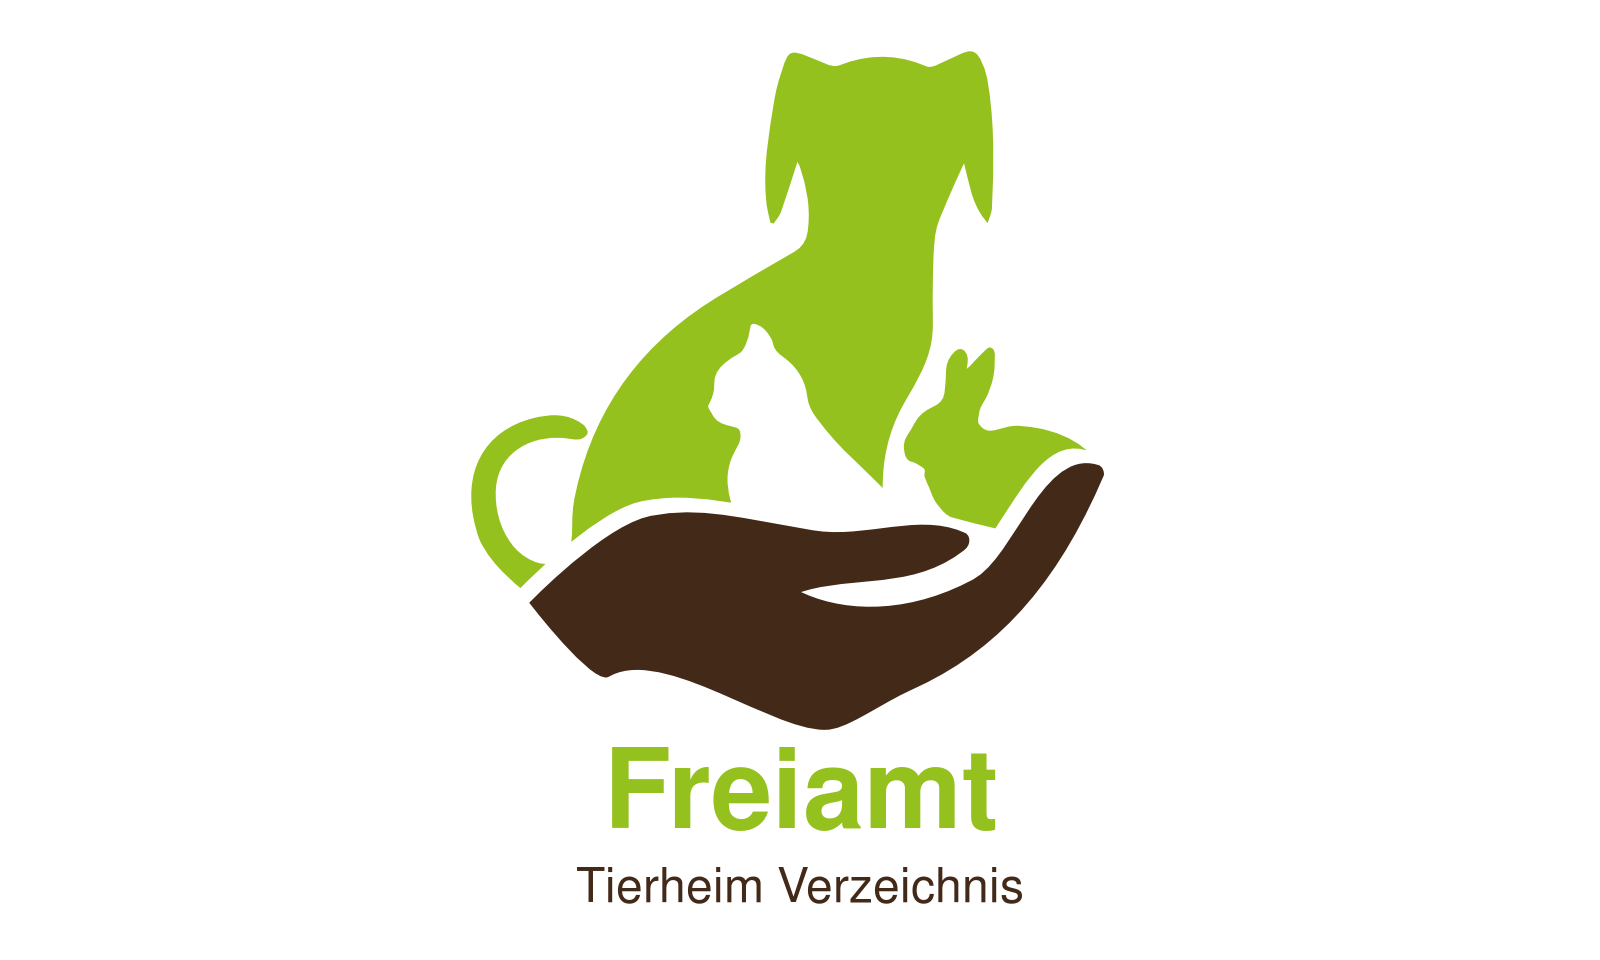 Tierheim Freiamt